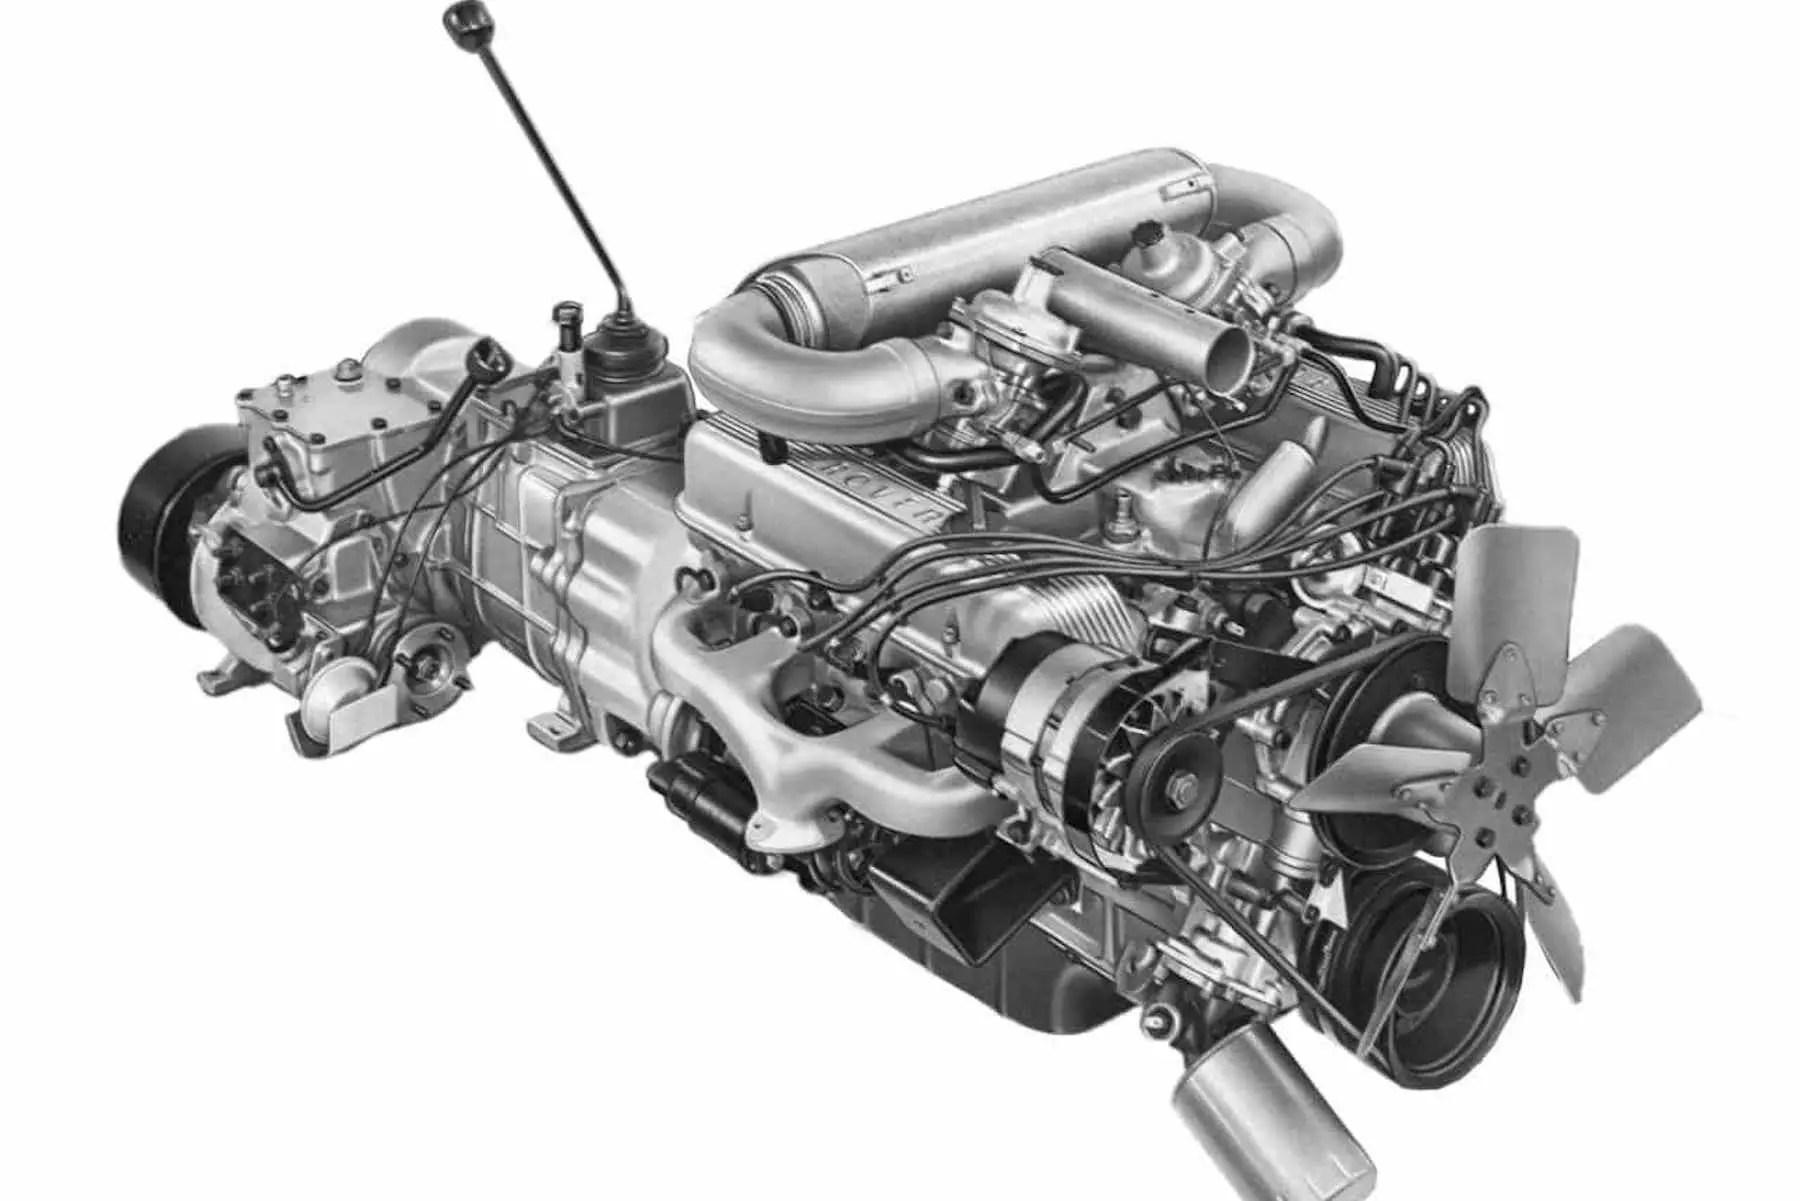 V8 Engine Cars Diagram Mazda Mx 5 Engine Diagram Wiring